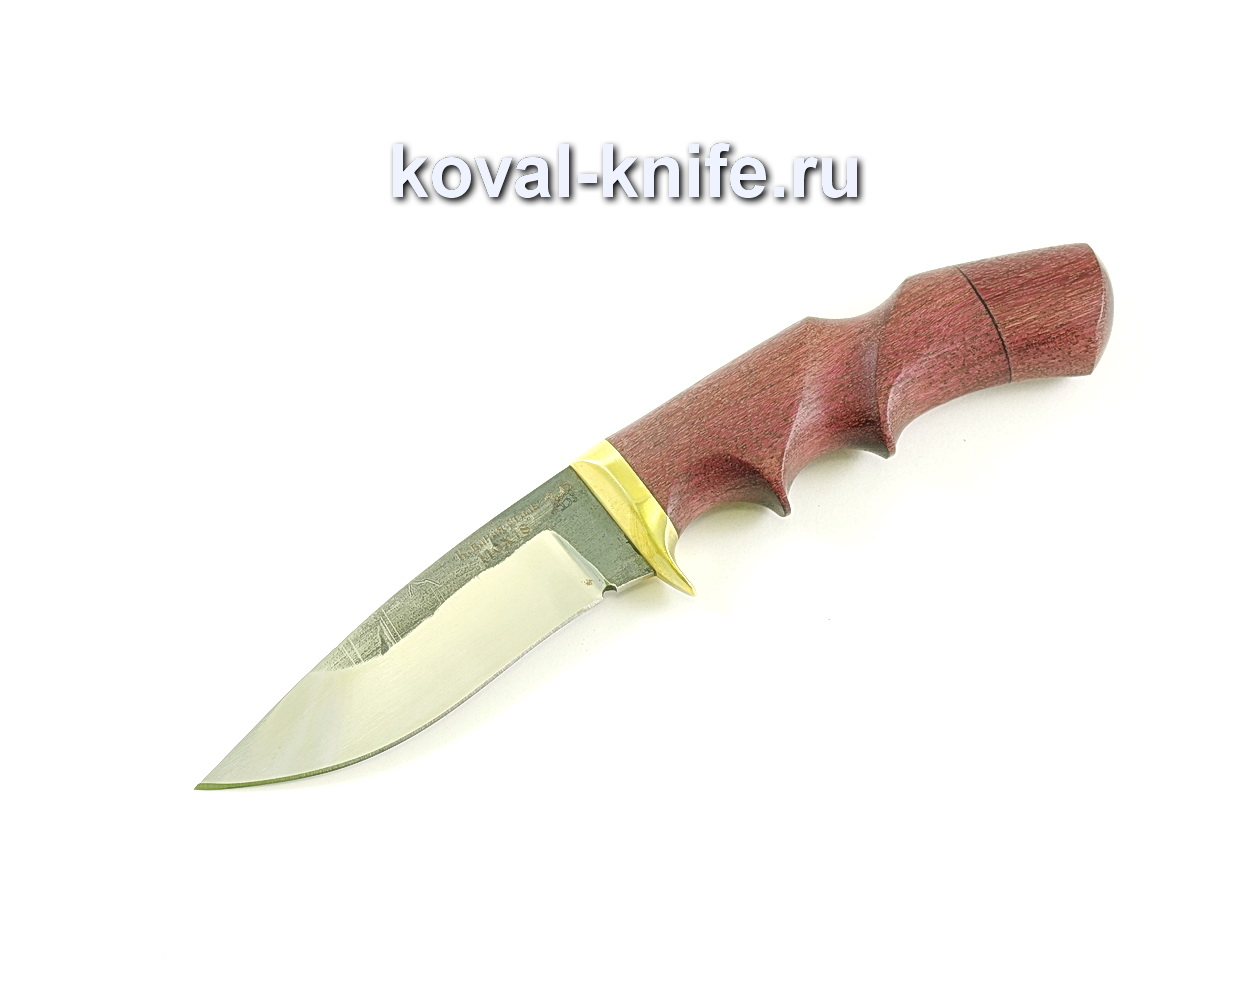 Нож Сапсан (сталь110х18), рукоять амарант, литье A031